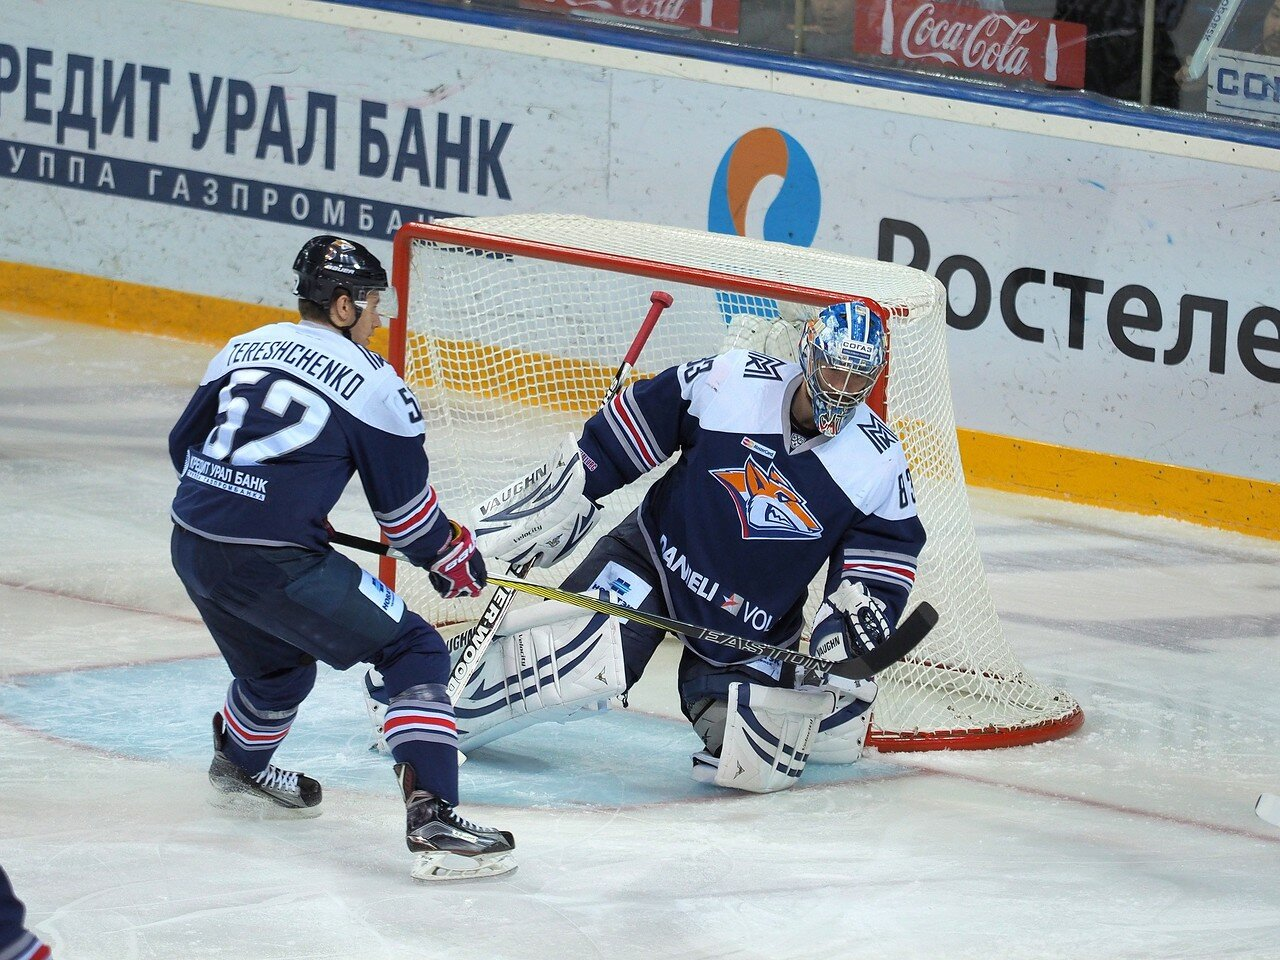 47Плей-офф 2016 Восток Финал Металлург - Салават Юлаев 31.03.2016